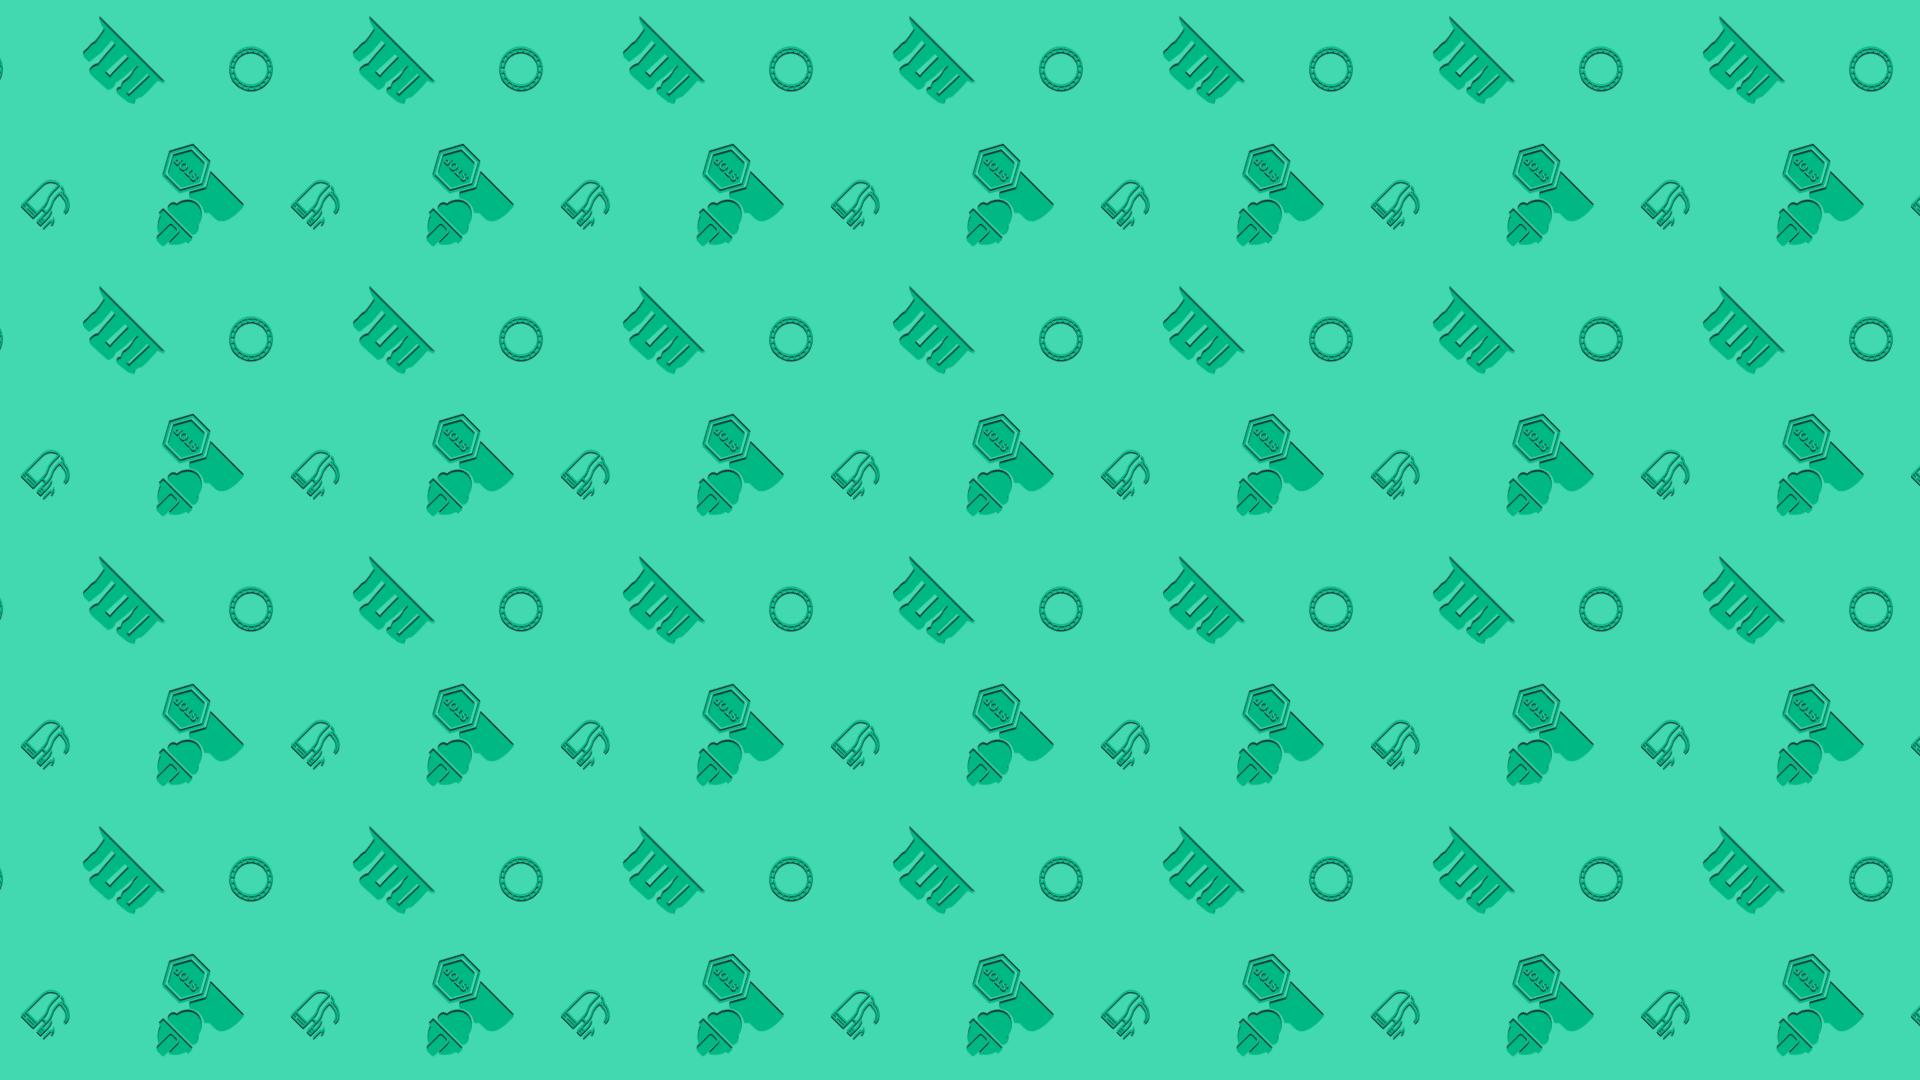 Green, Pattern, Aqua, Grass, Design, Font, Line, Computer, Wallpaper, Fun, Construction, Hard, Man,  Free Image